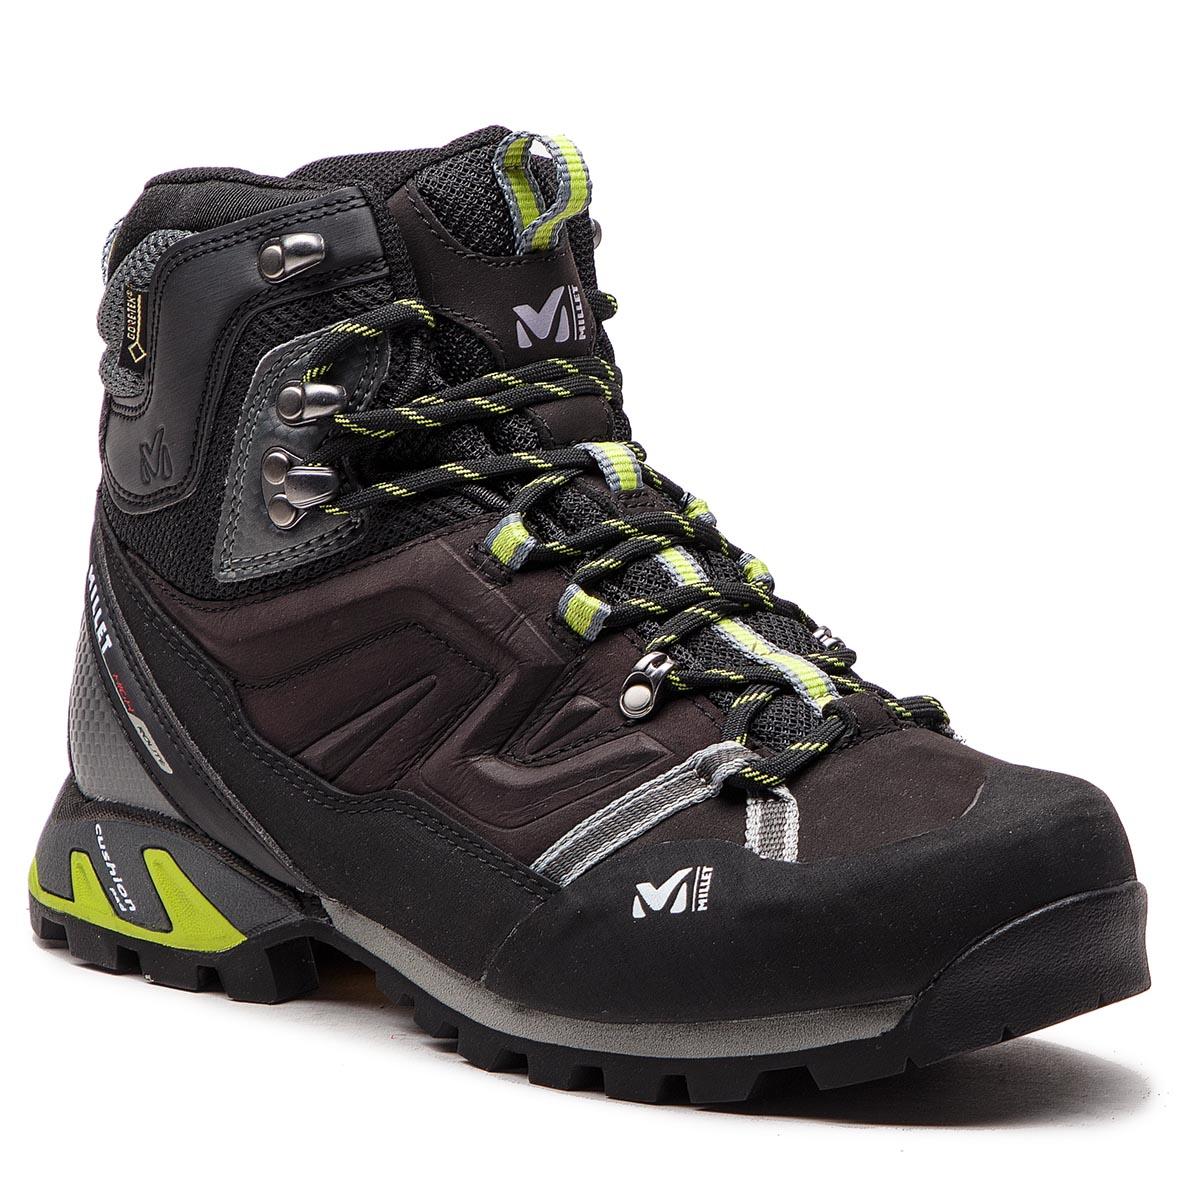 58a8f79a7ae Trekker Boots MILLET - High Route Gtx MIG1784 Black/Acid Green 7216 ...